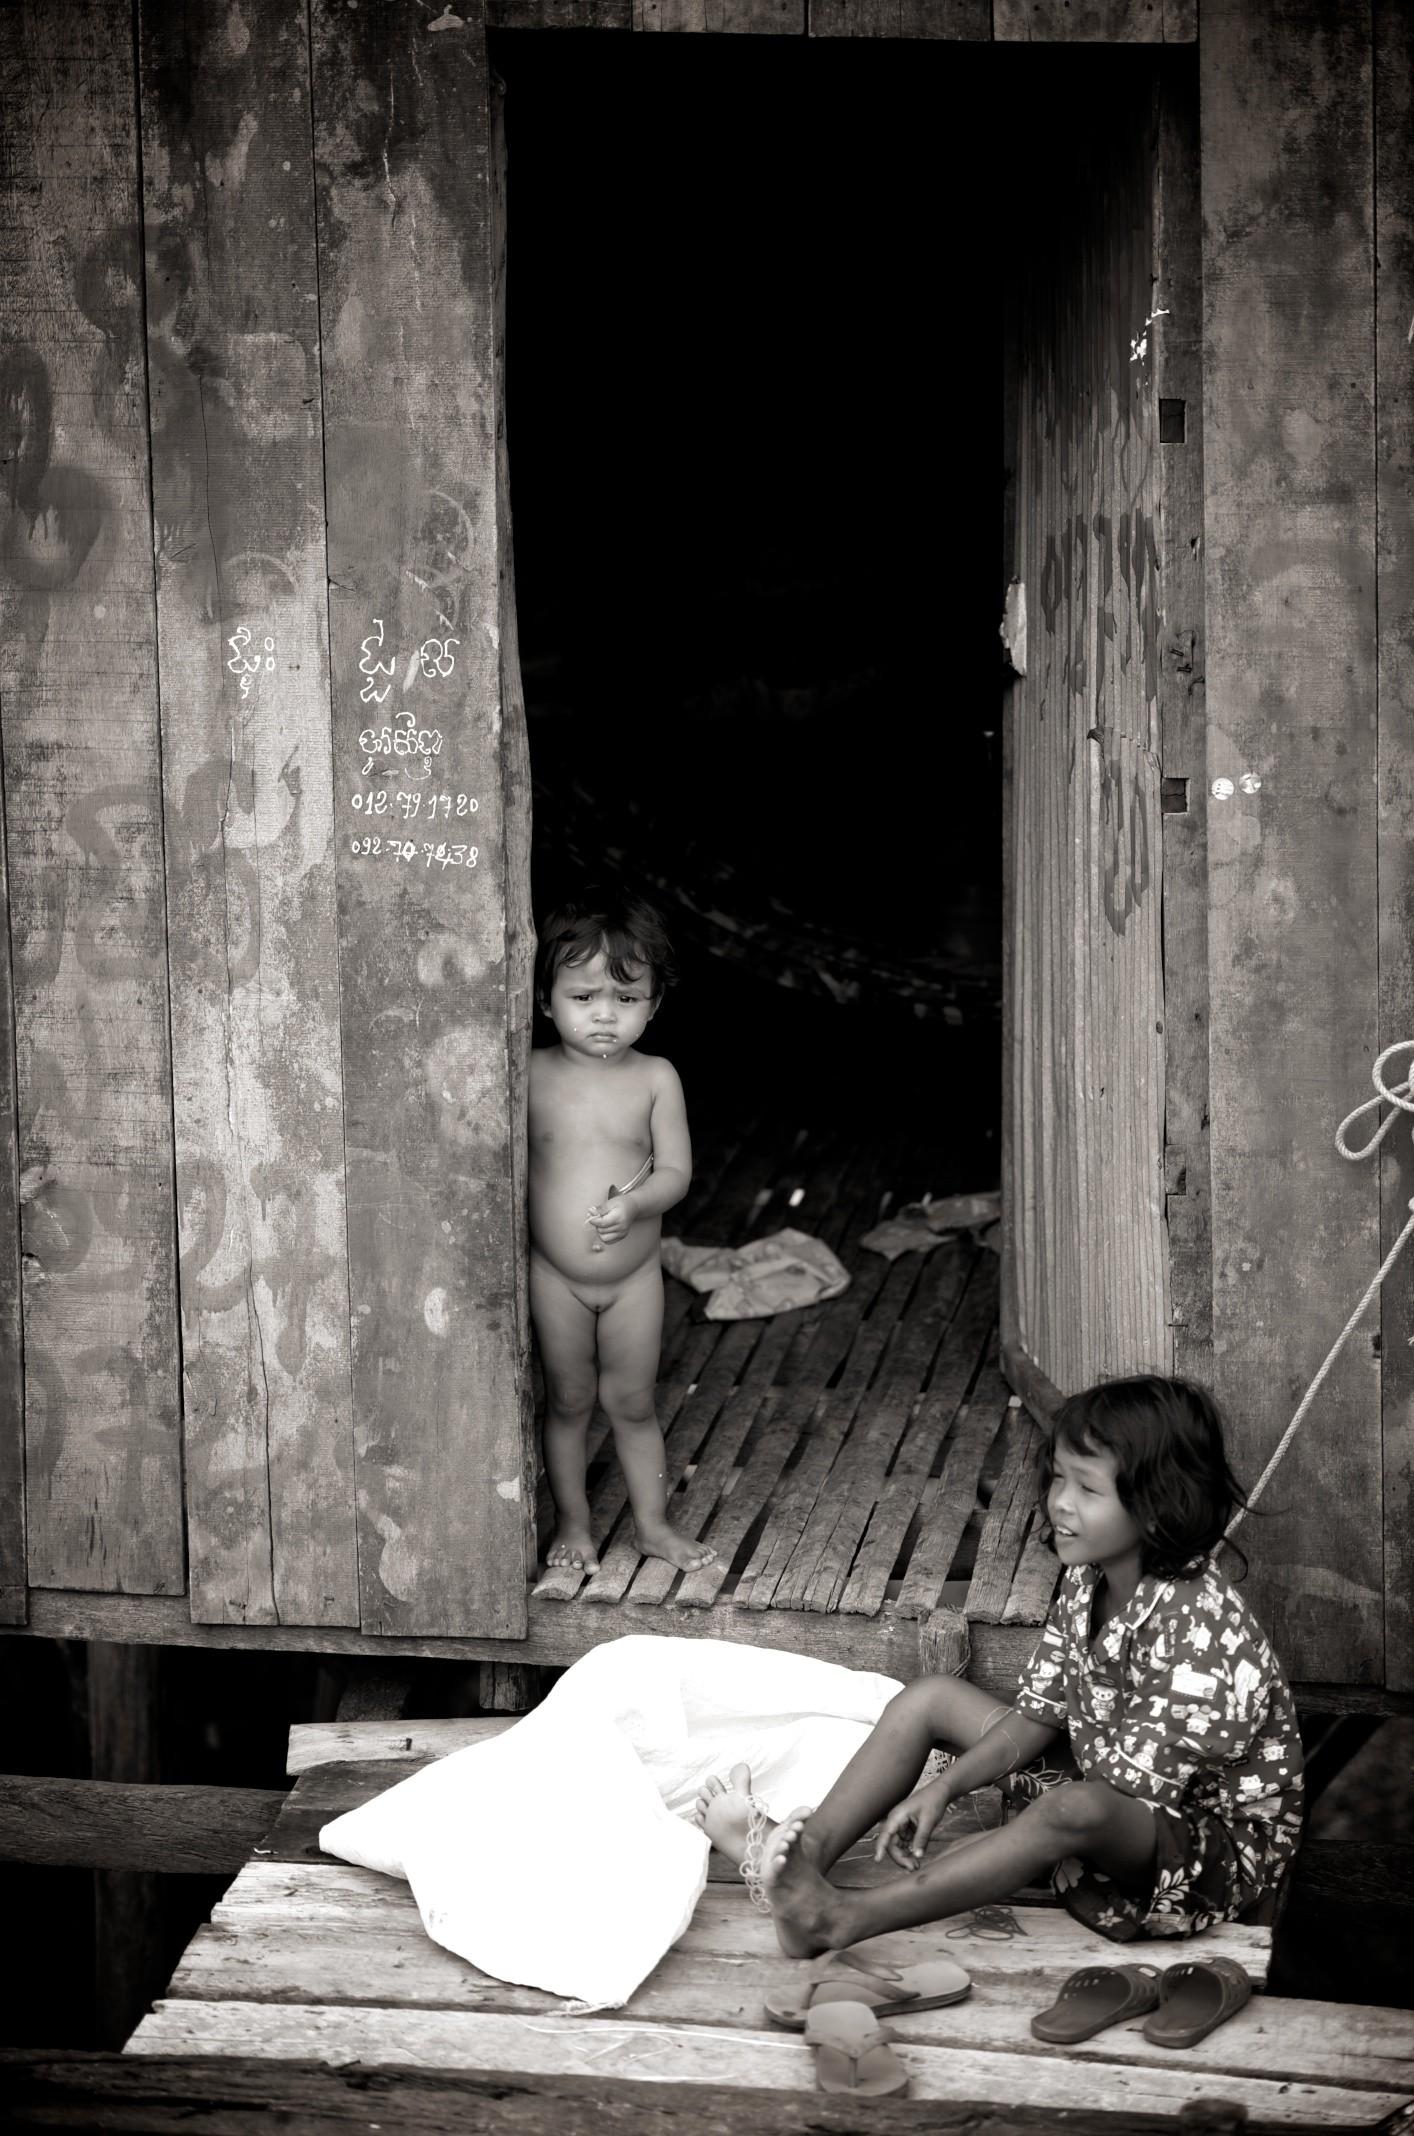 AlexSoh_July09 Cambodia072